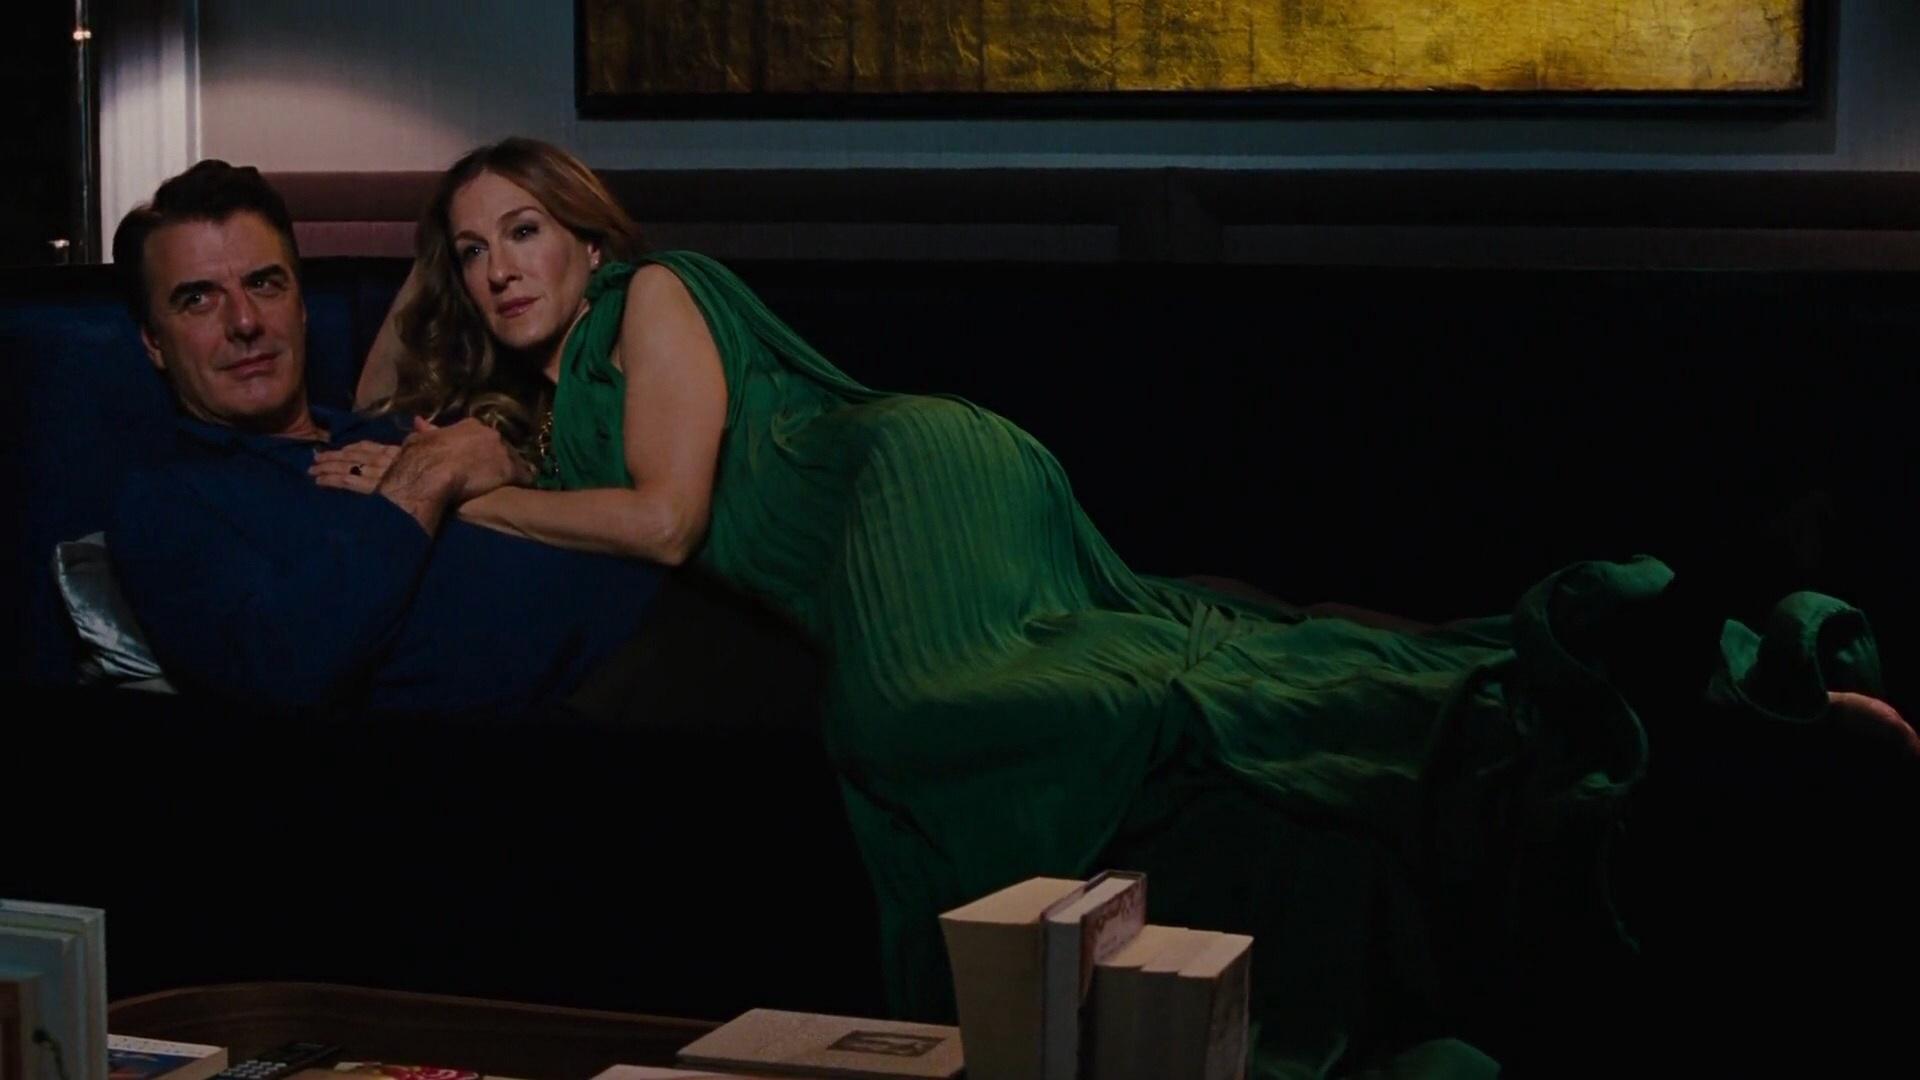 seks-v-bolshom-gorode-smotret-sezon